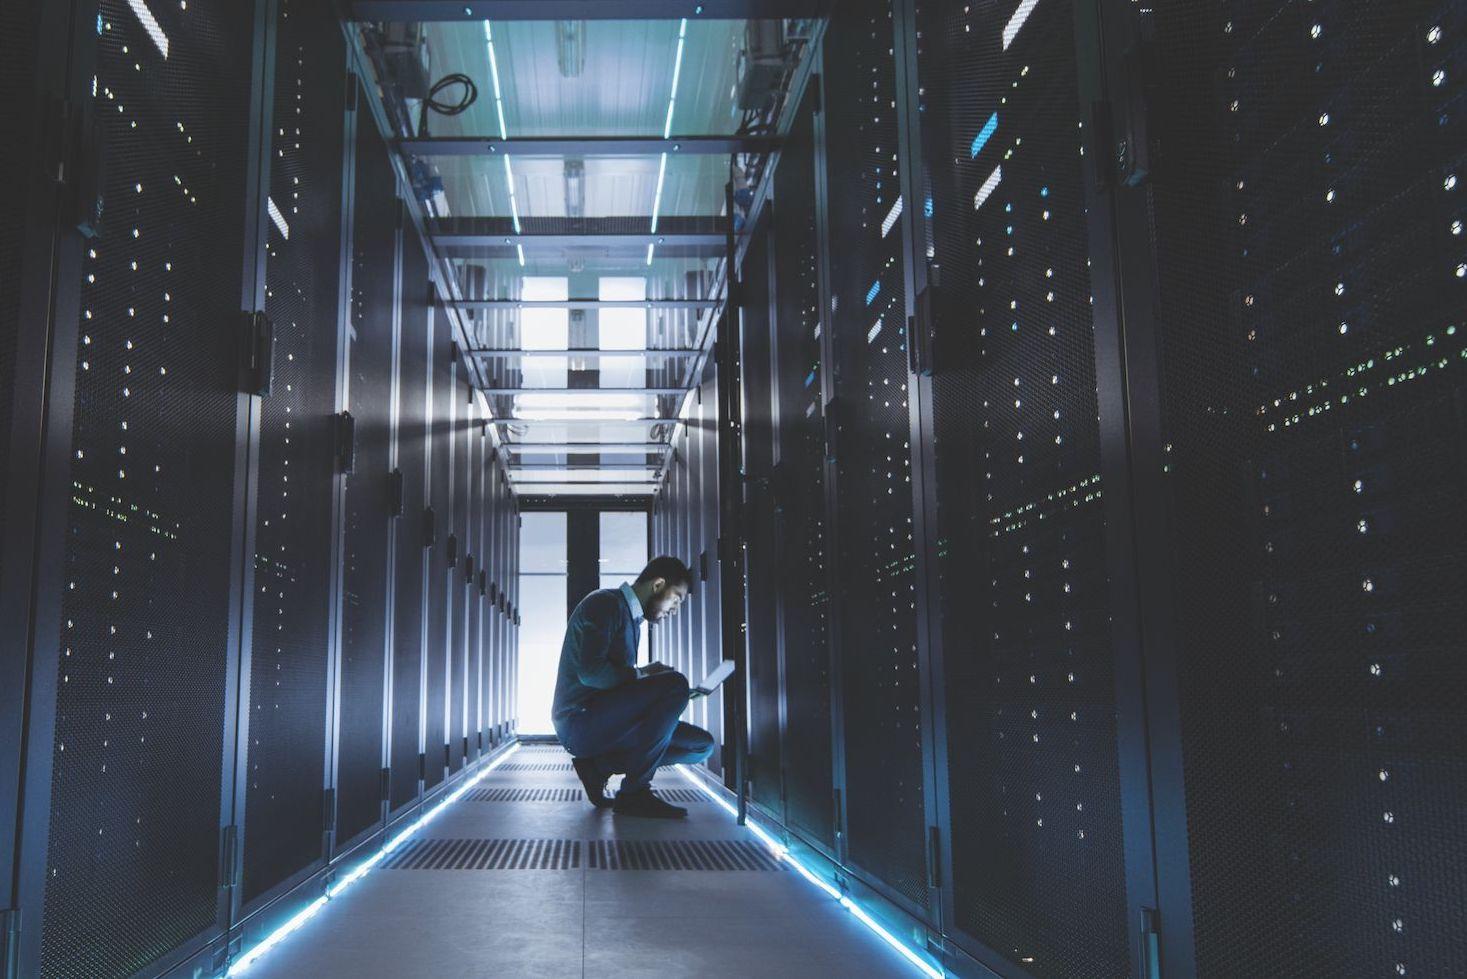 Data center for digital transformation of the enterprise